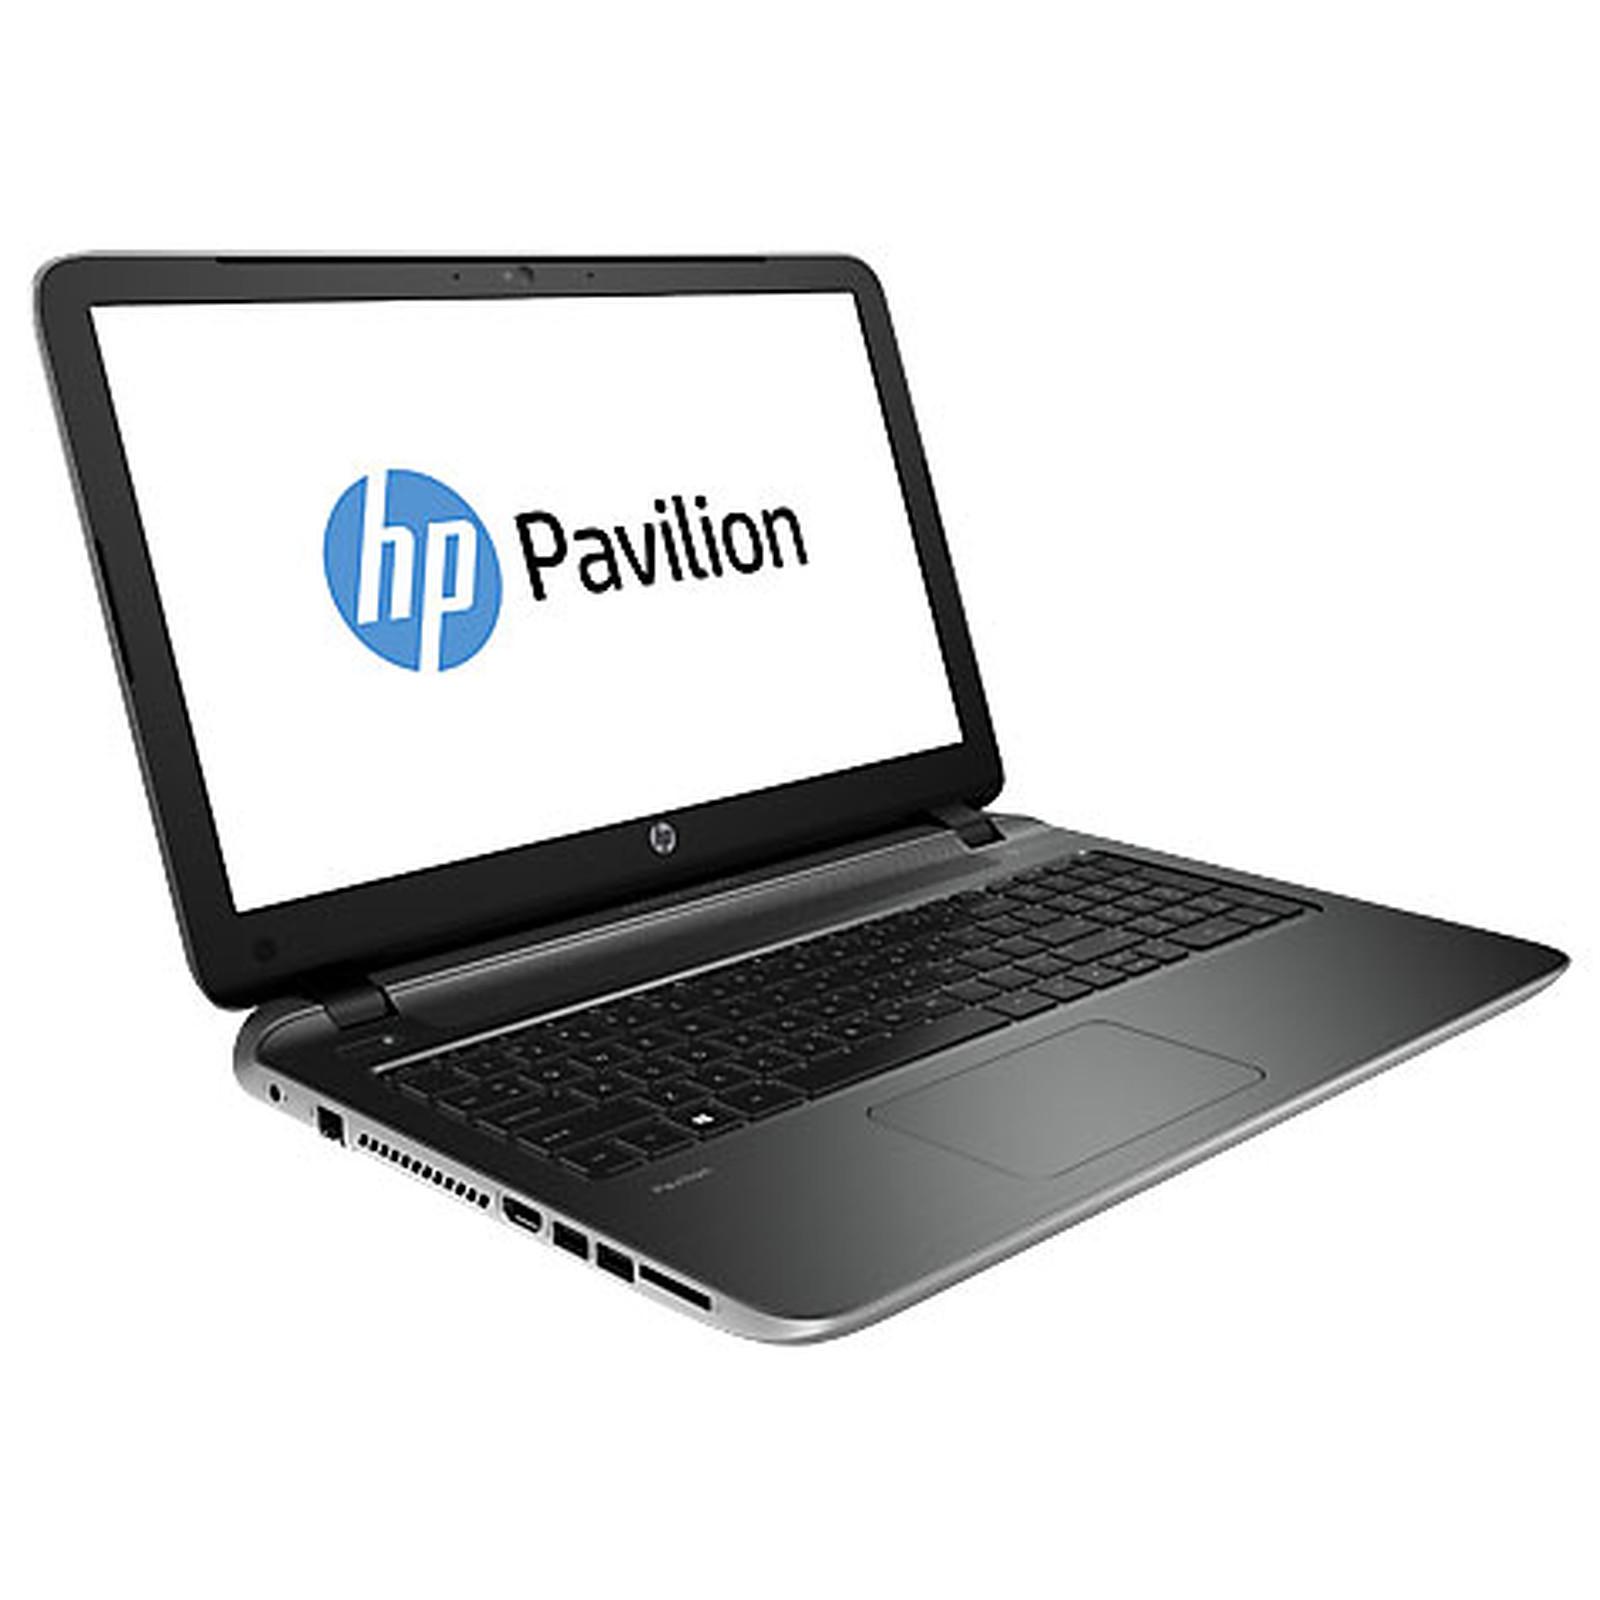 HP Pavilion 15-p005nf